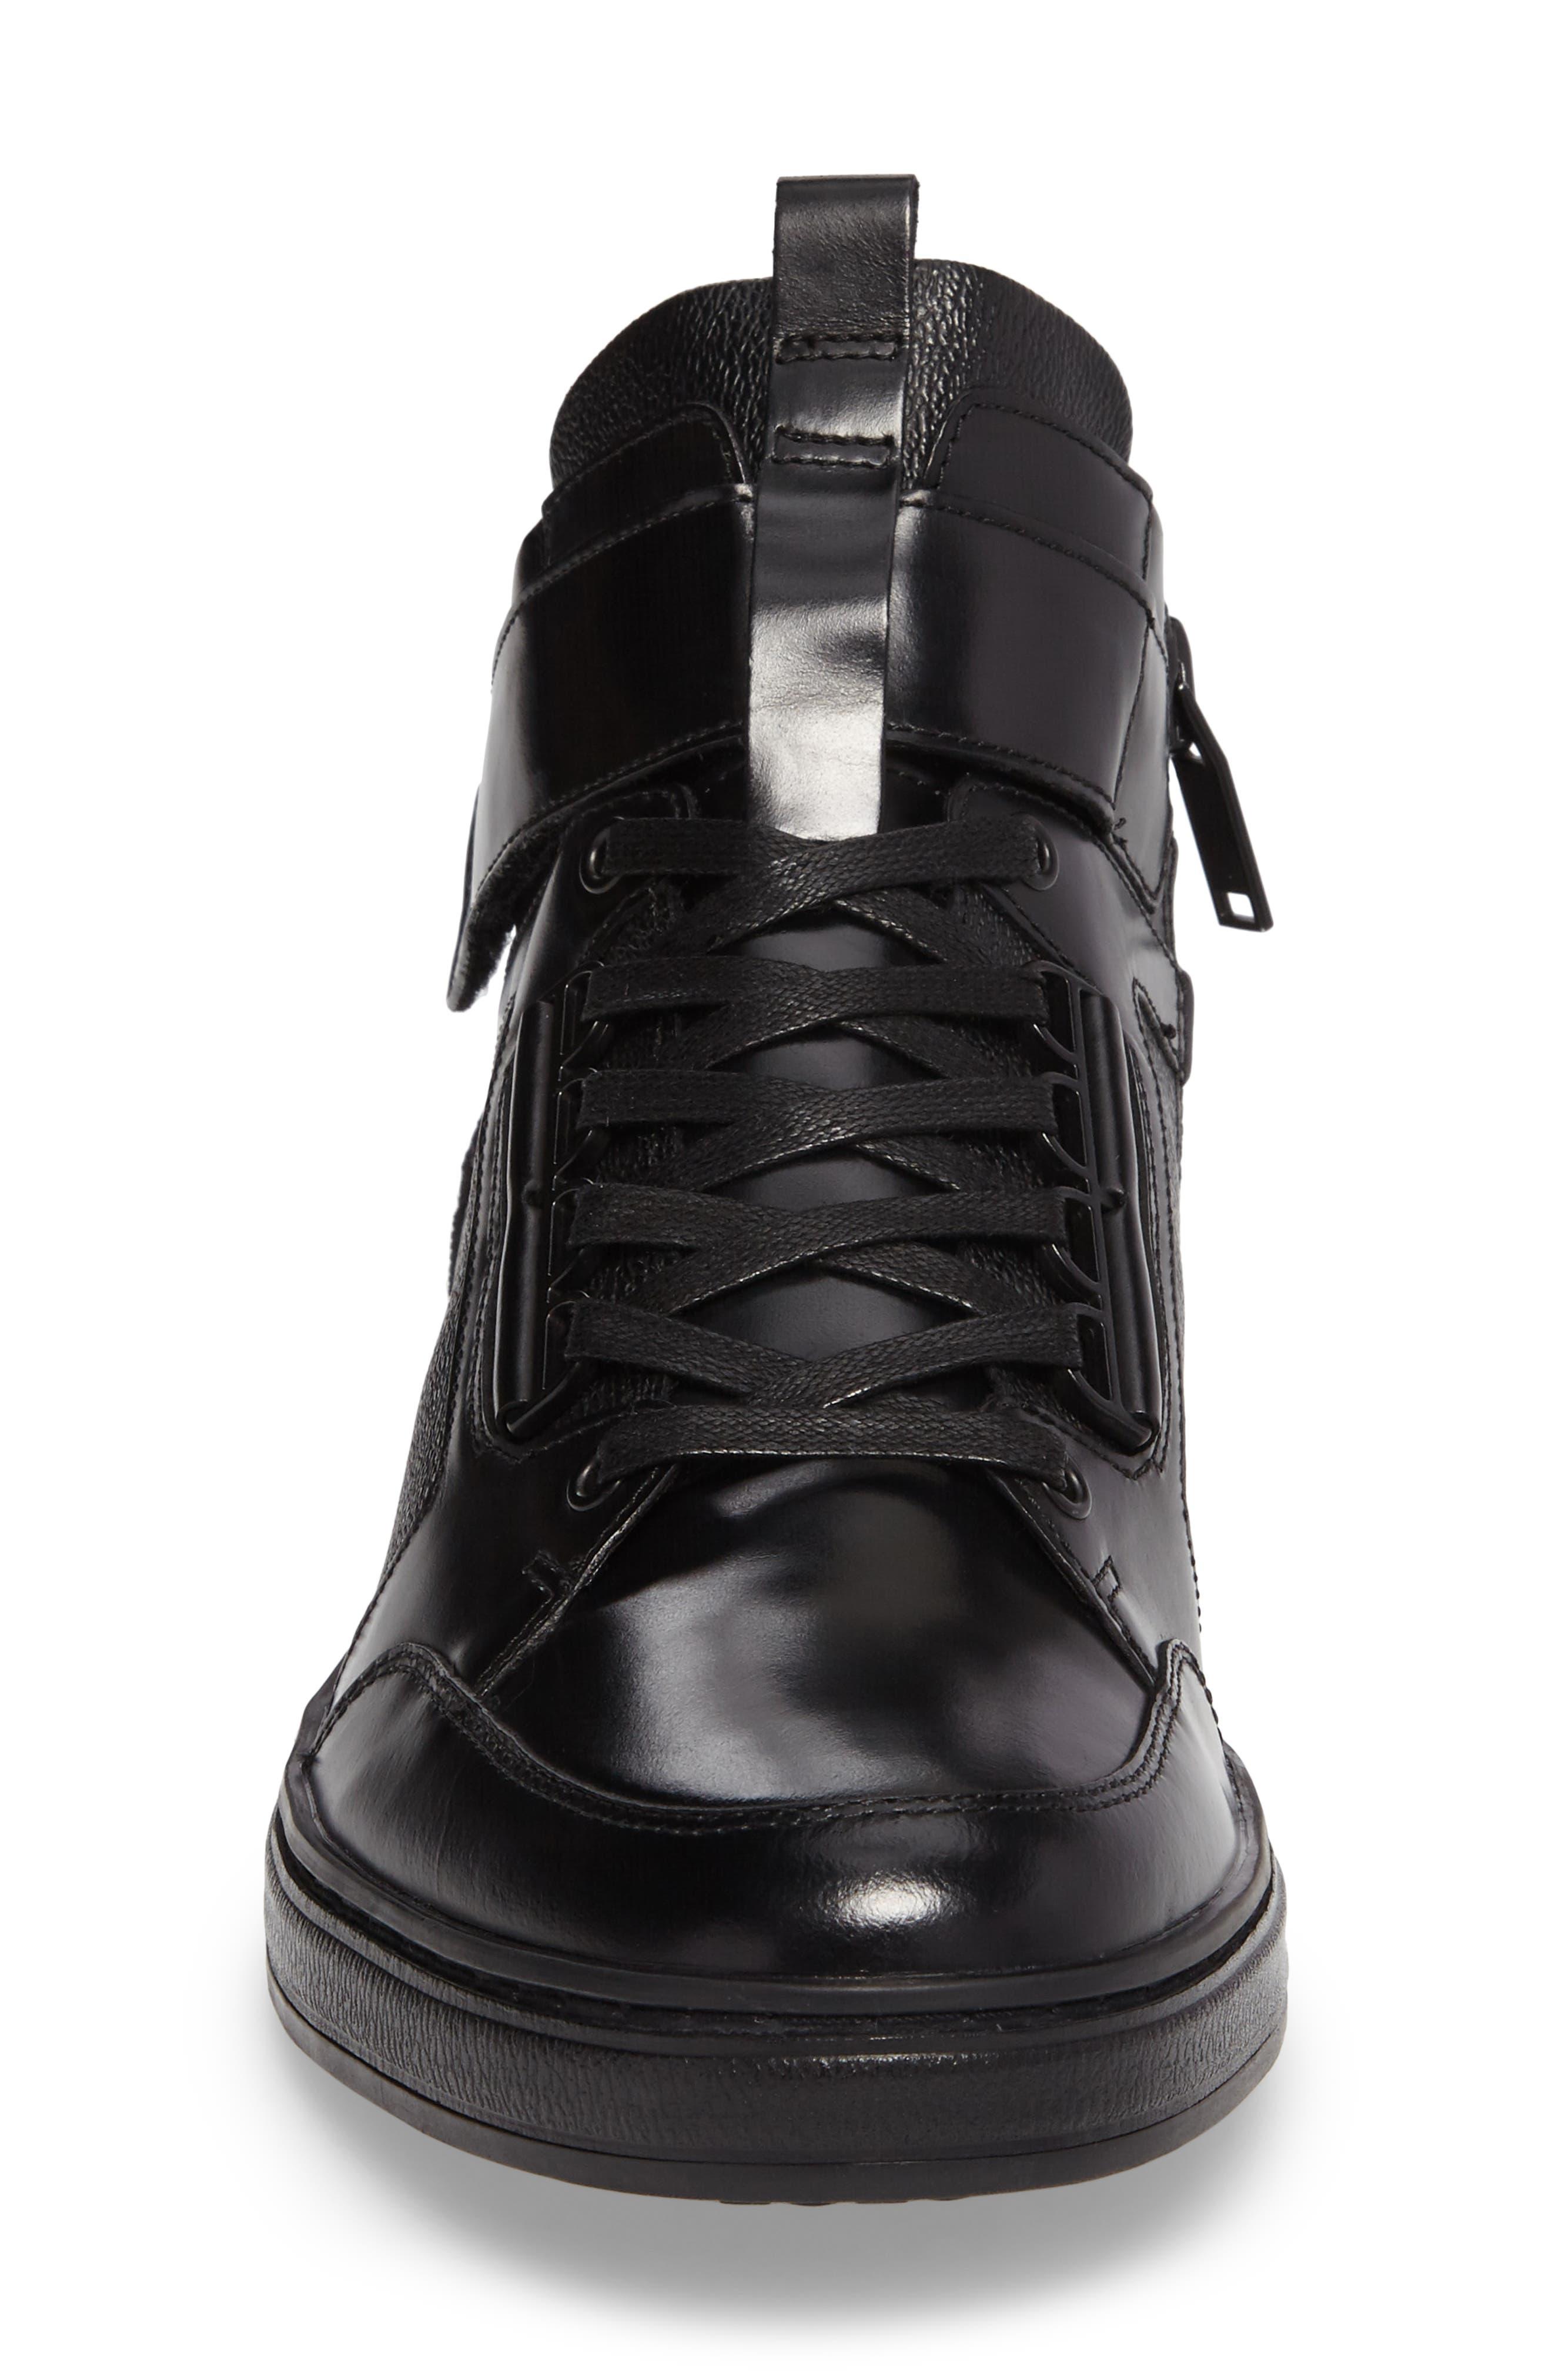 Brand-Y Sneaker,                             Alternate thumbnail 4, color,                             001